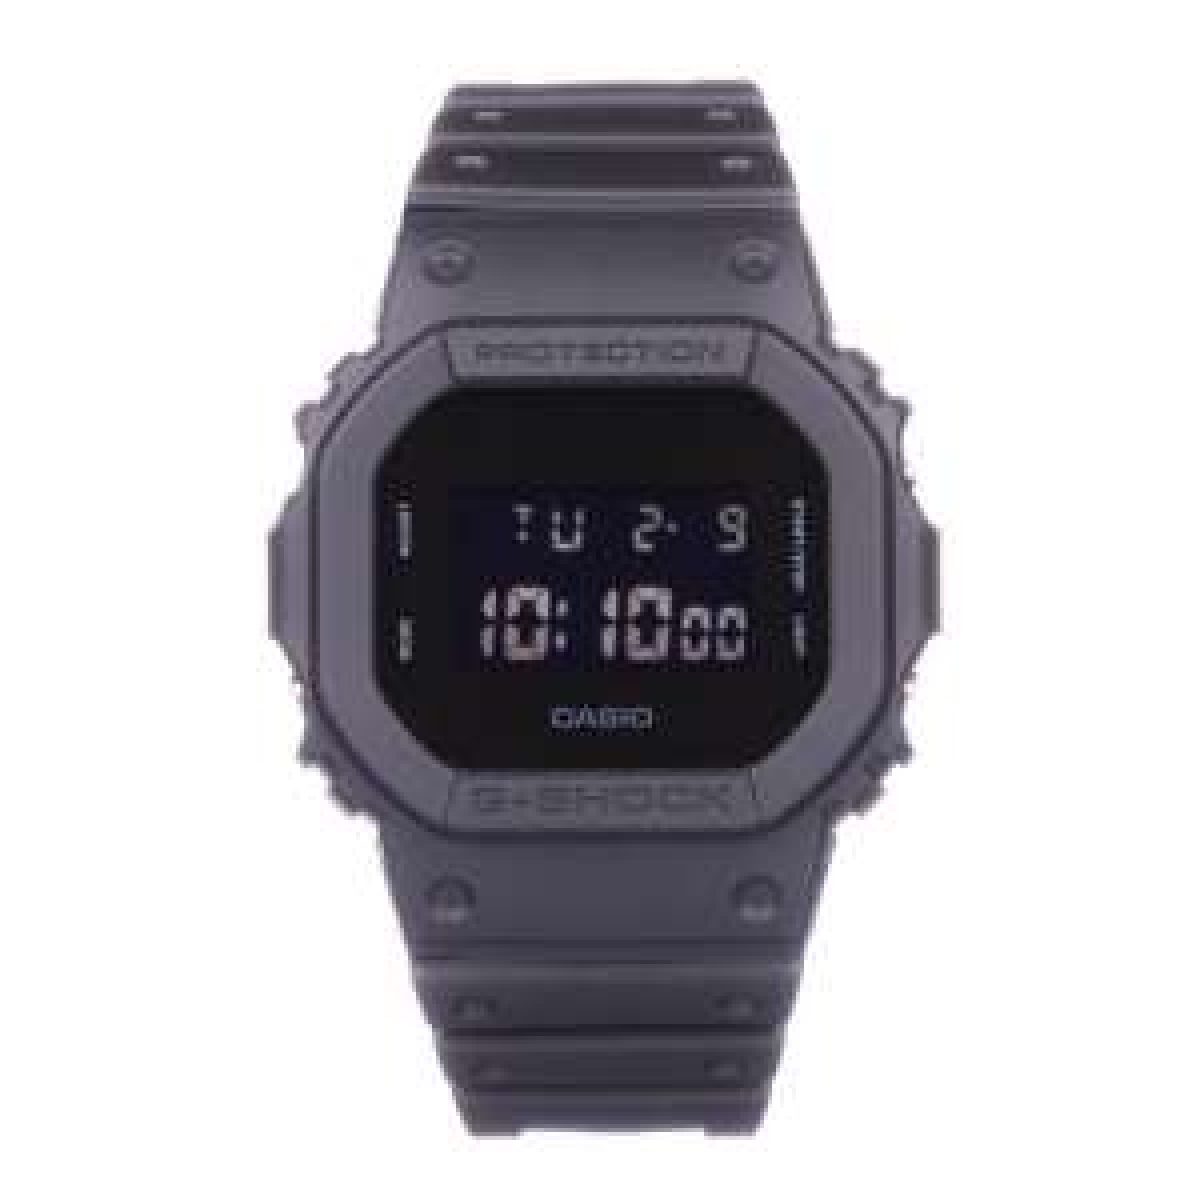 Casio G-Shock - DW-5600BB-1ER - Heren - Horloge - 38.5 mm